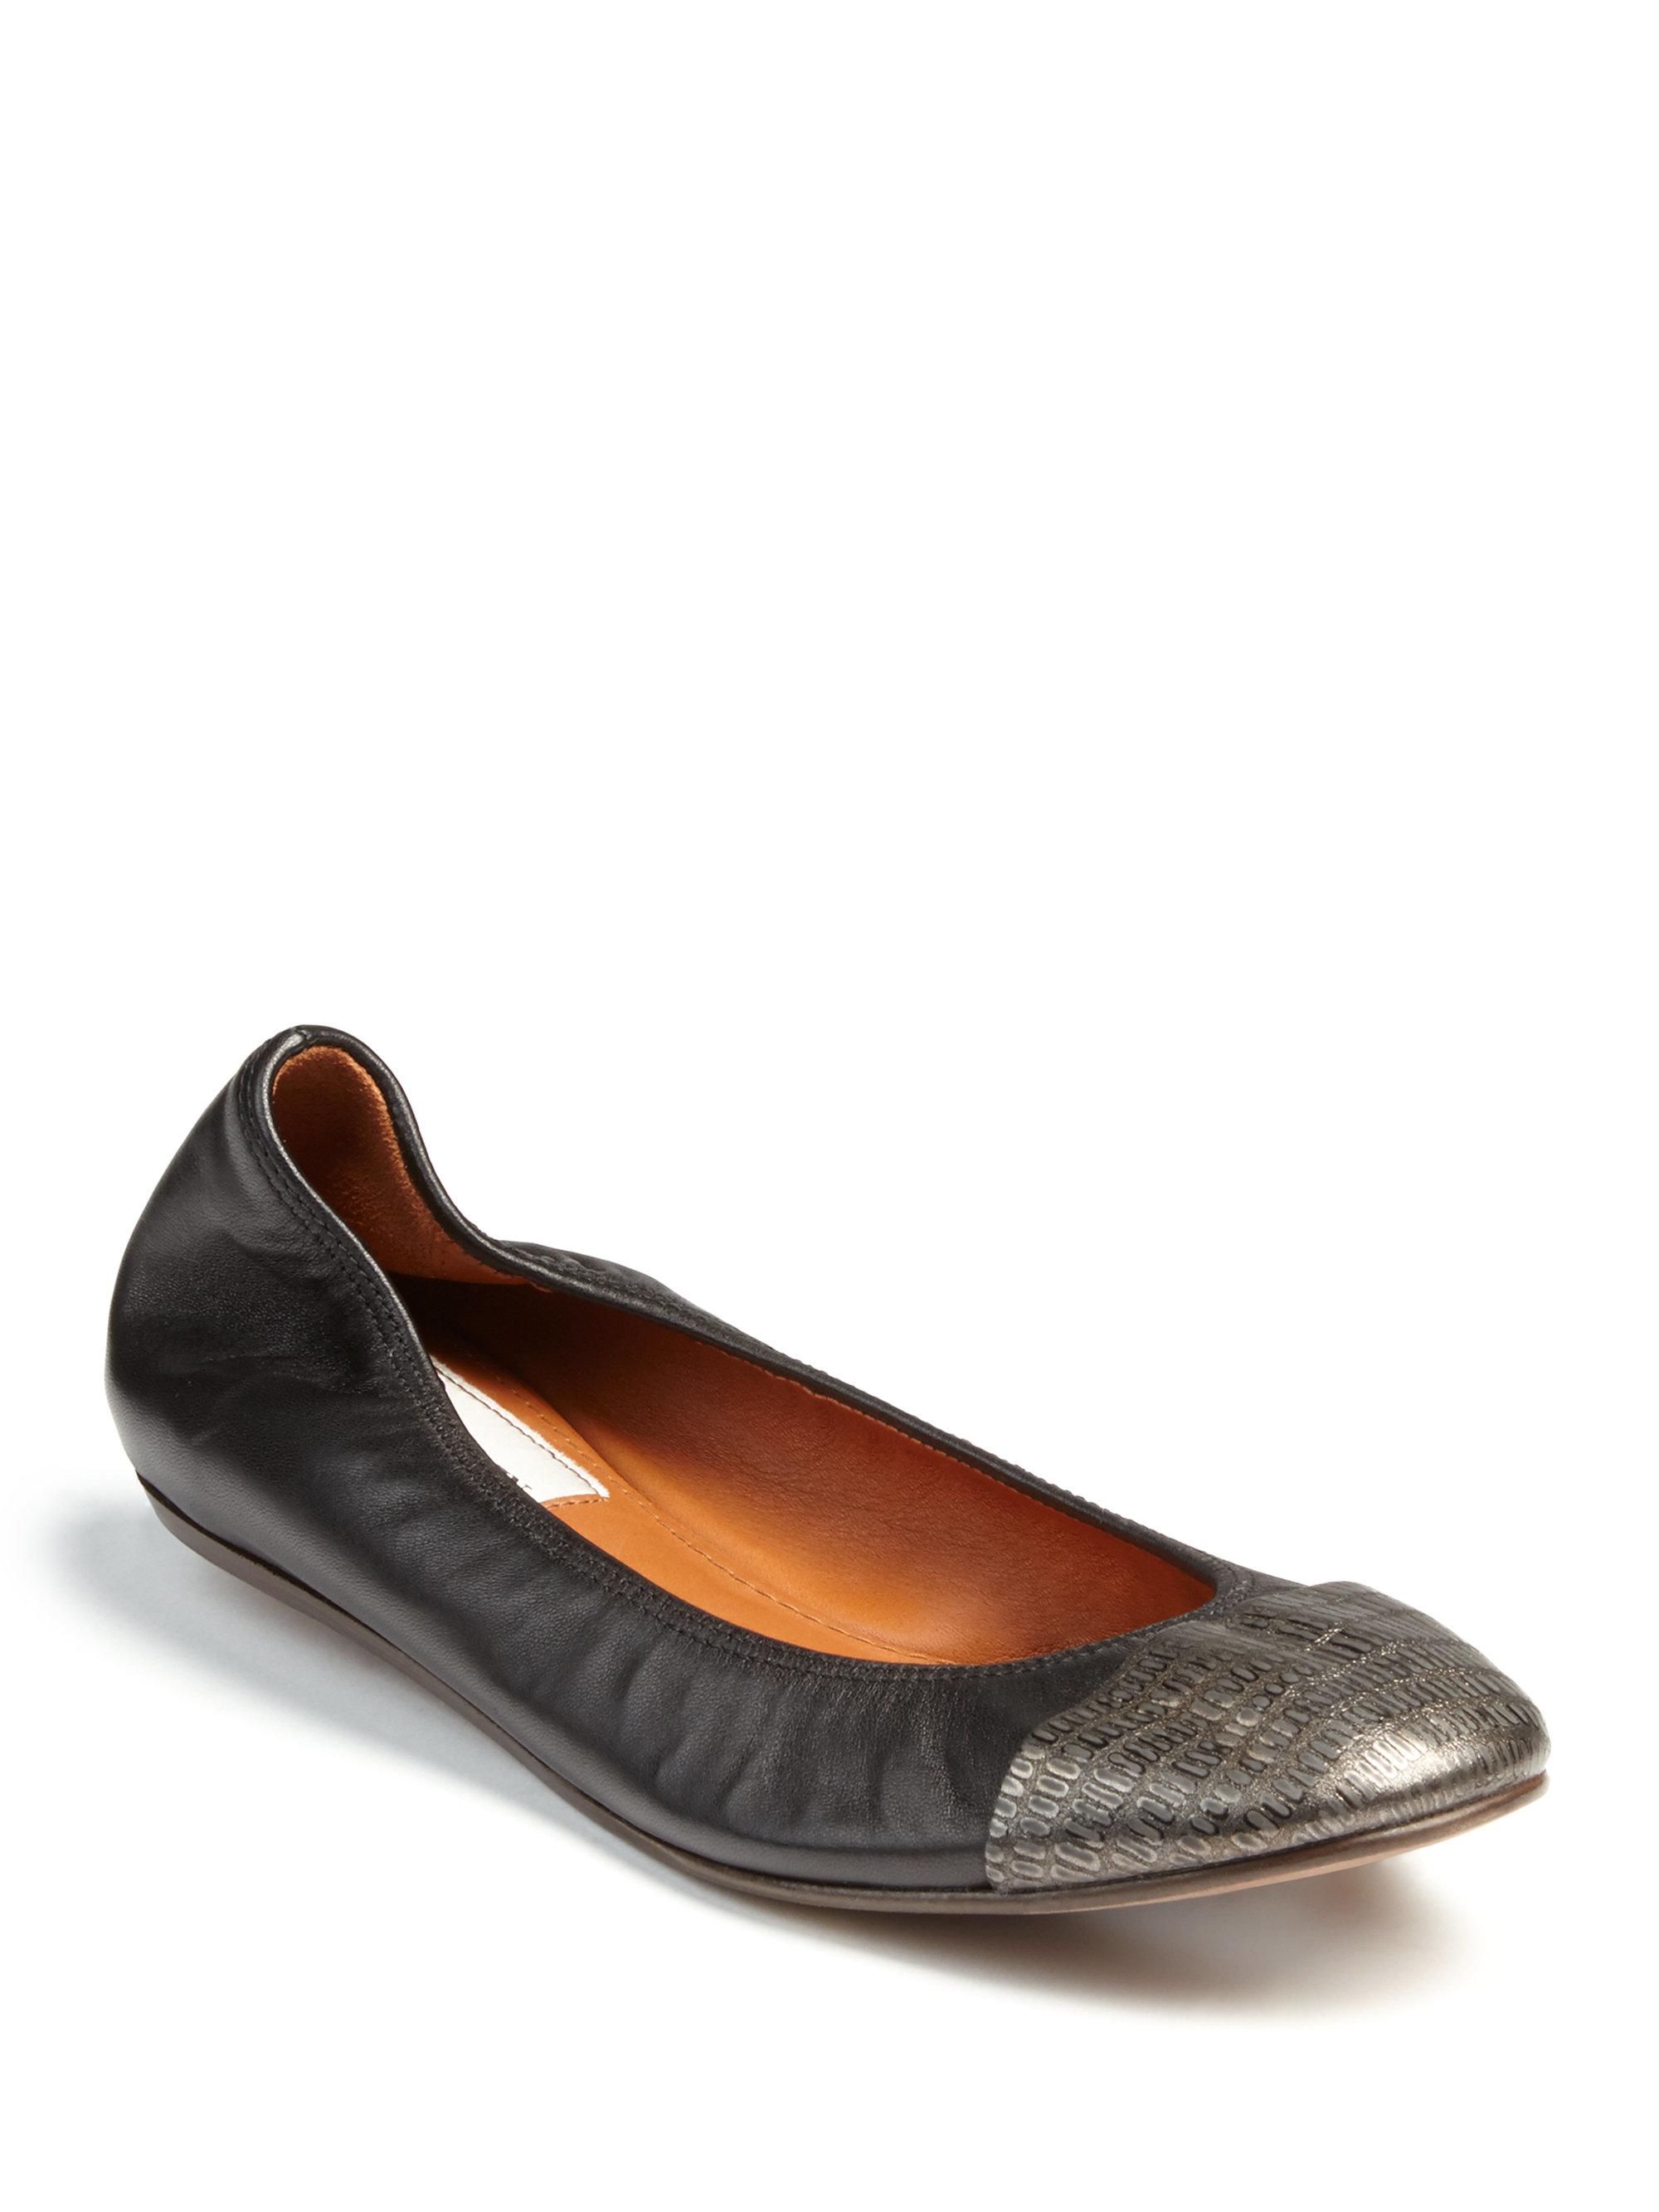 Womens Flats Lanvin Metallic Snake Embossed Leather Flats Flats Big Sale